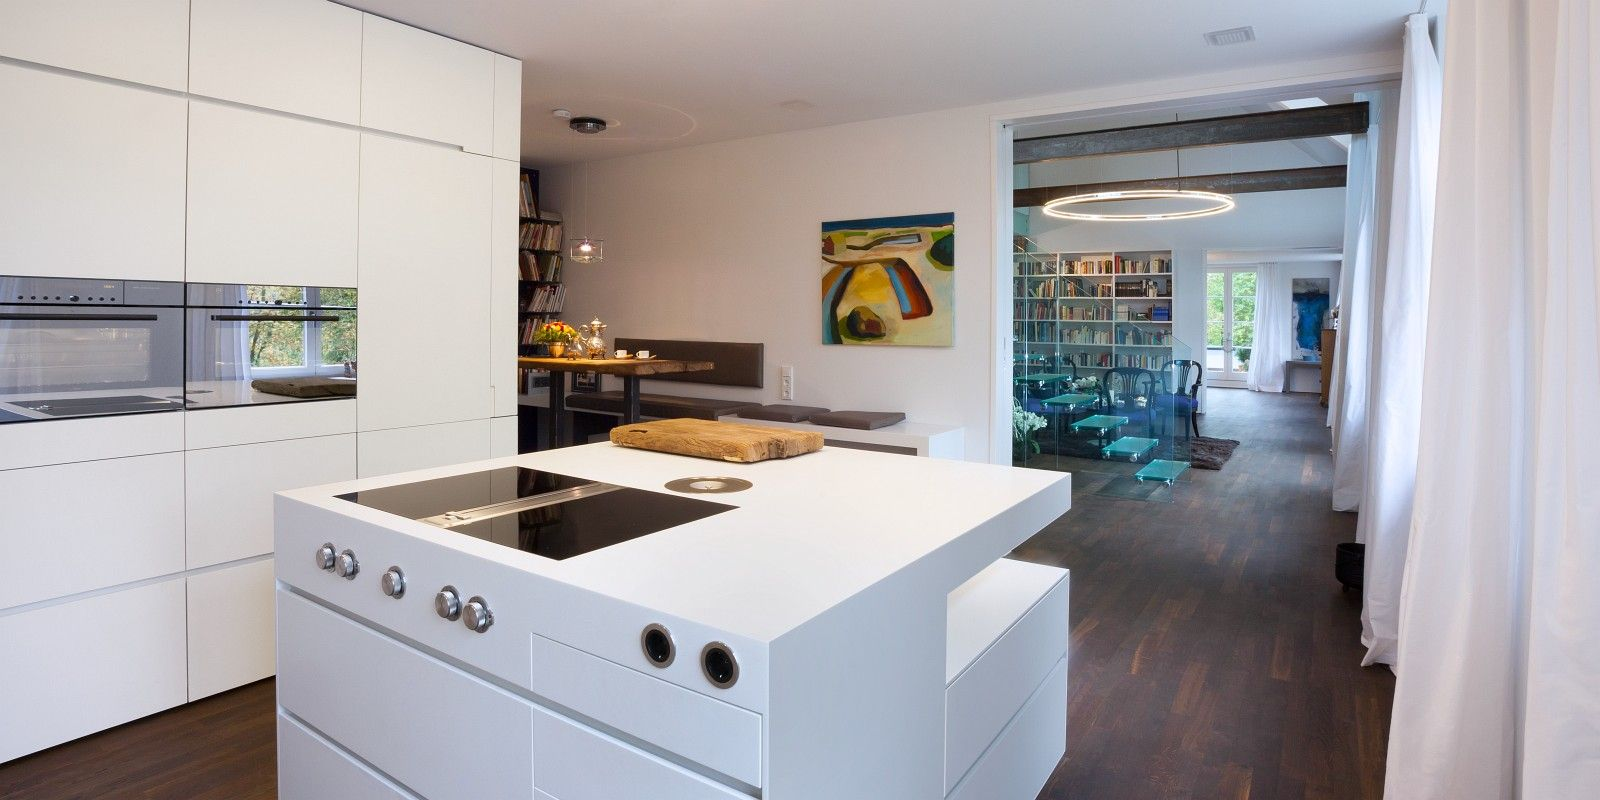 Kochinsel mit Bora-Dunstabzug. Blick ins Kamninzimmer | Küchenideen ...